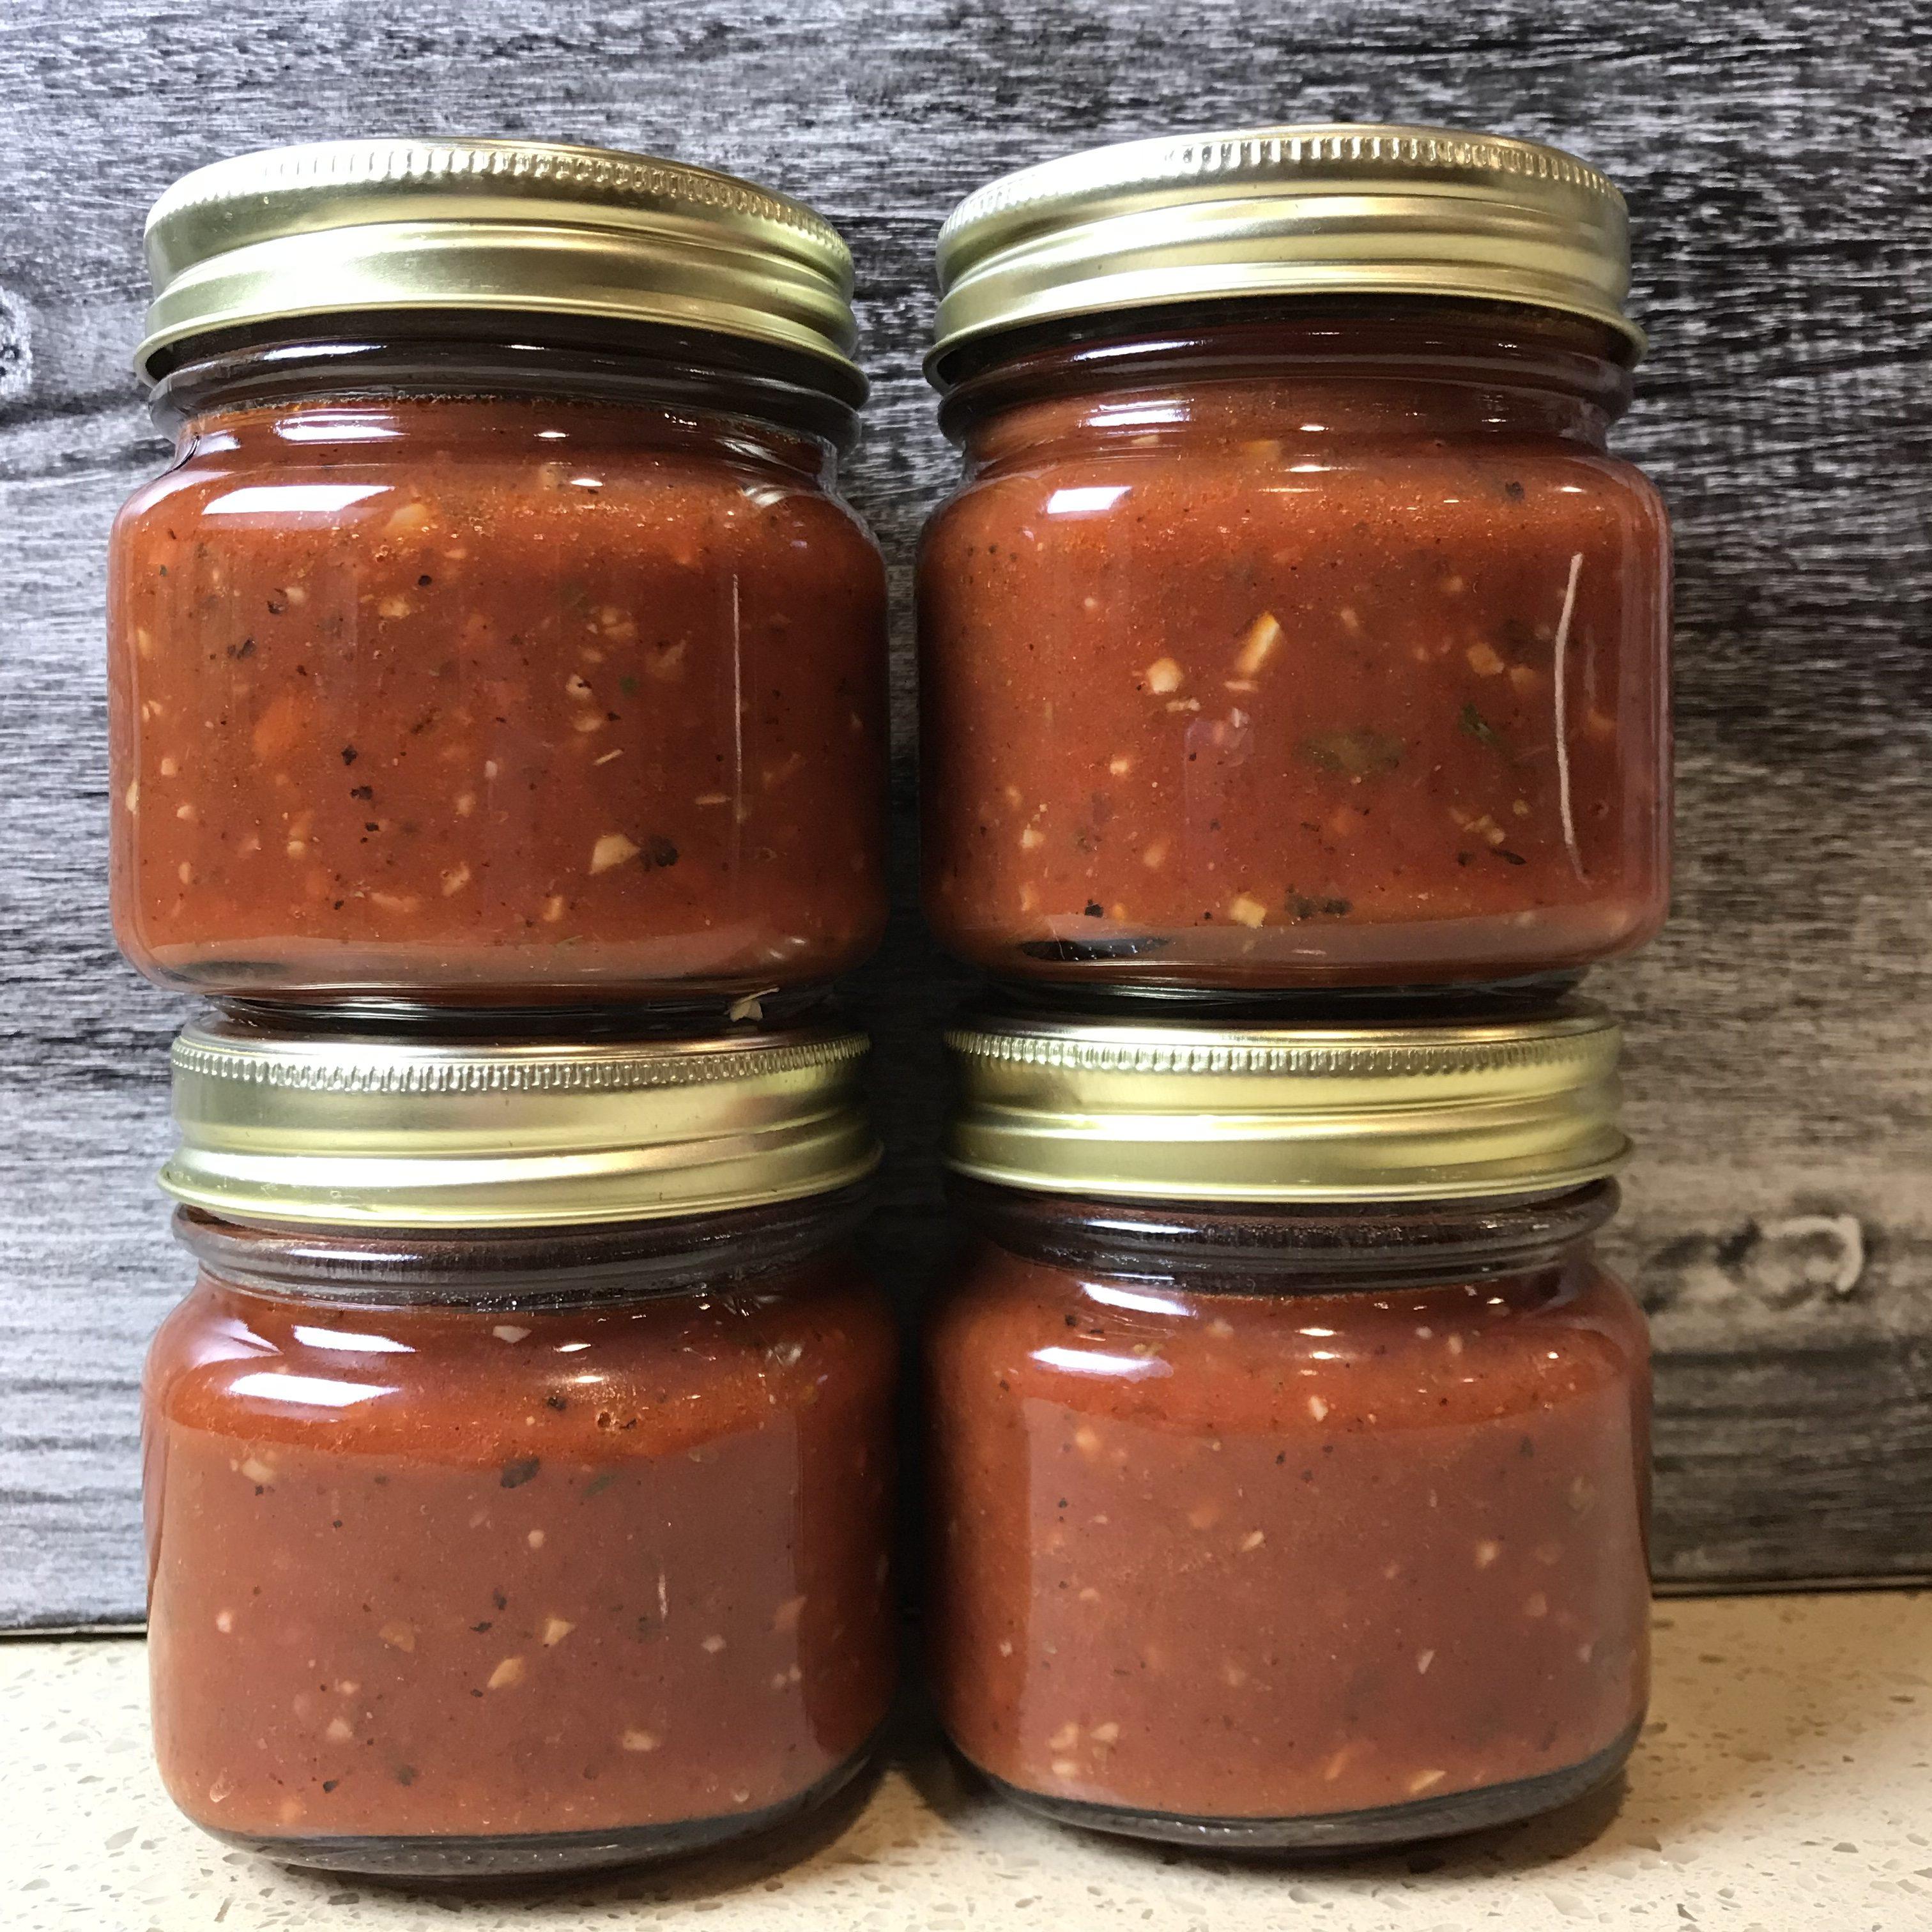 Garlic & Herb Marinara Sauce